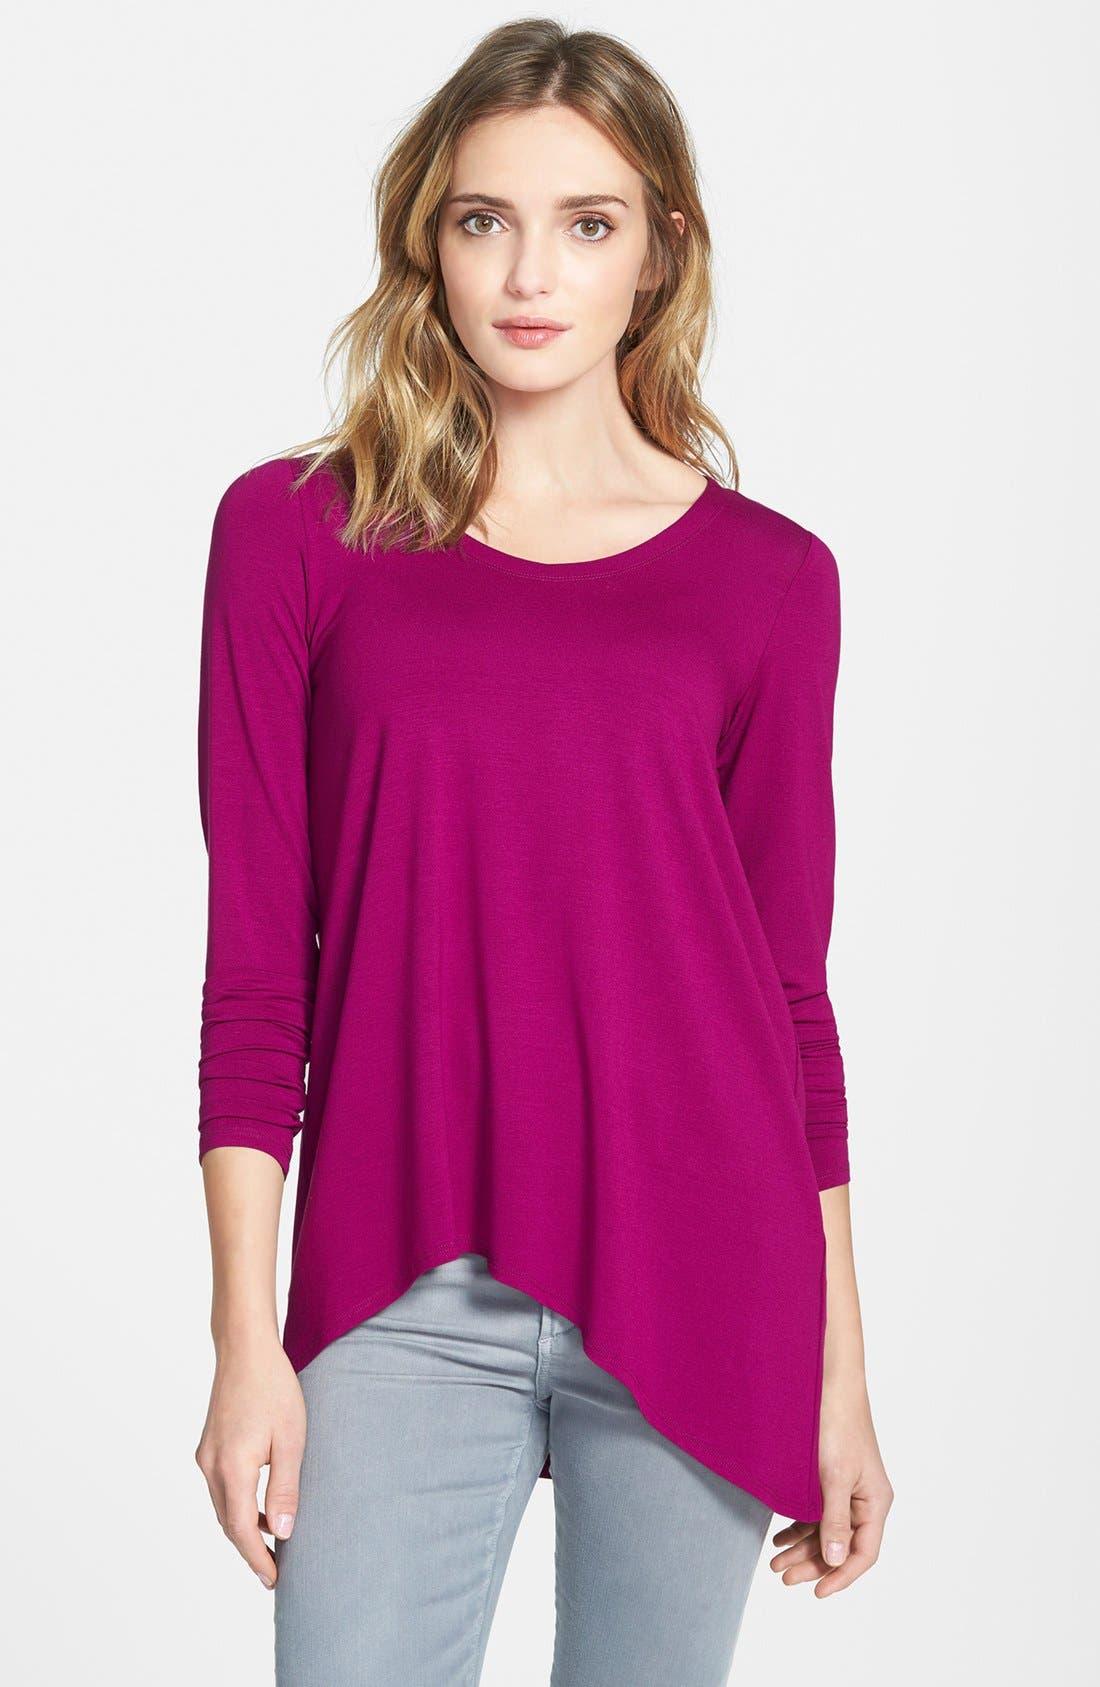 Alternate Image 1 Selected - Eileen Fisher V-Neck Stretch Knit Top (Regular & Petite)